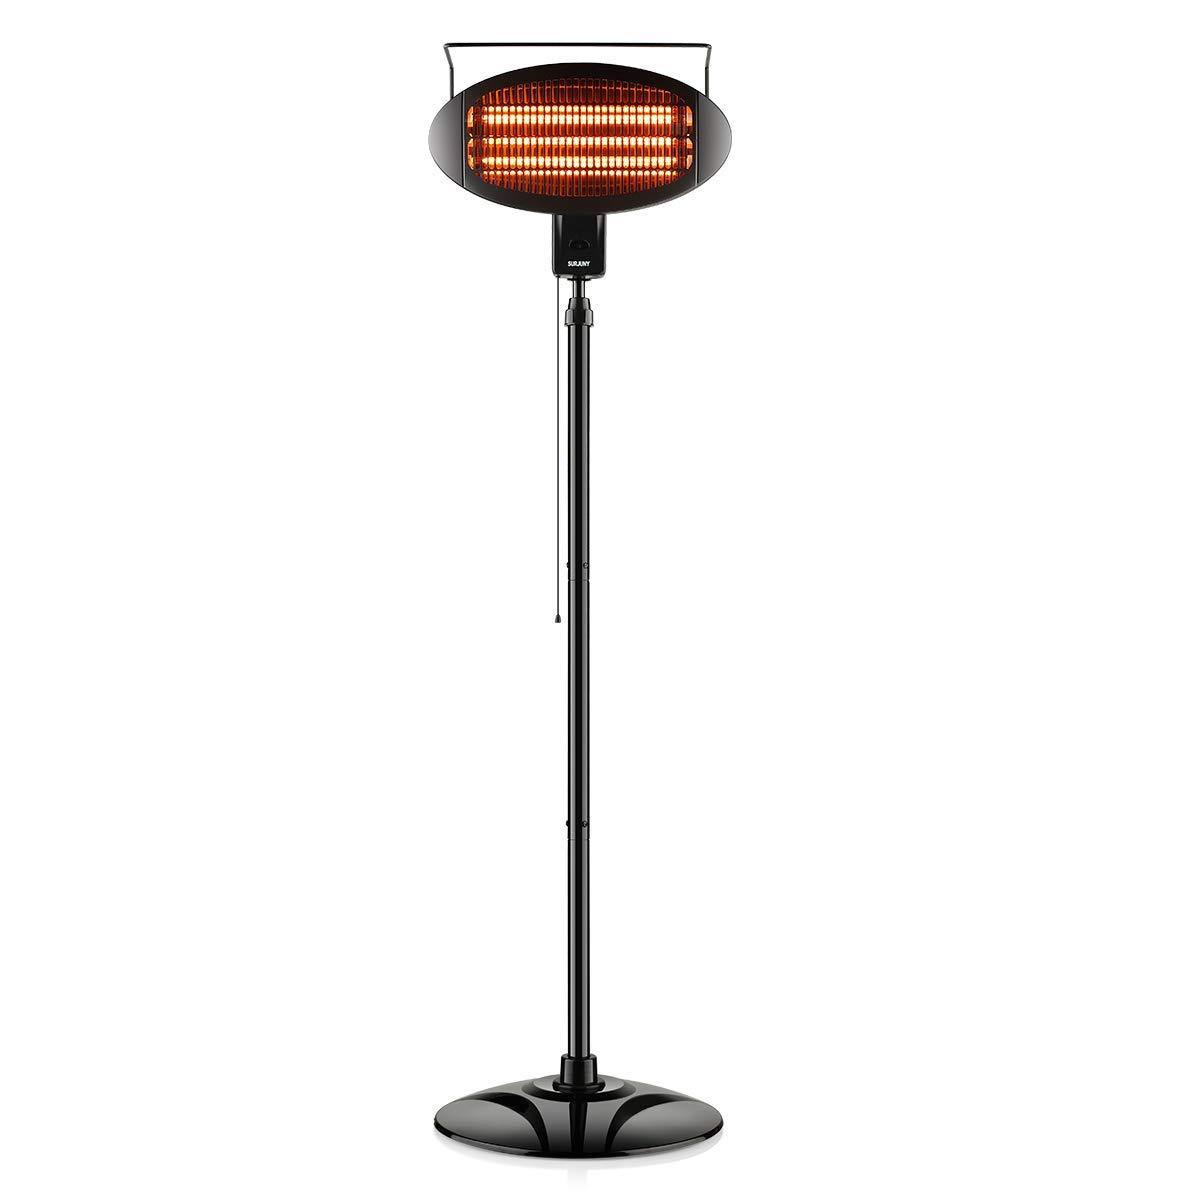 SURJUNY Patio Heater, Electric Heater with 3 Power Levels, Halogen Space Heater for Indoor/Outdoor Use, Waterproof, D01